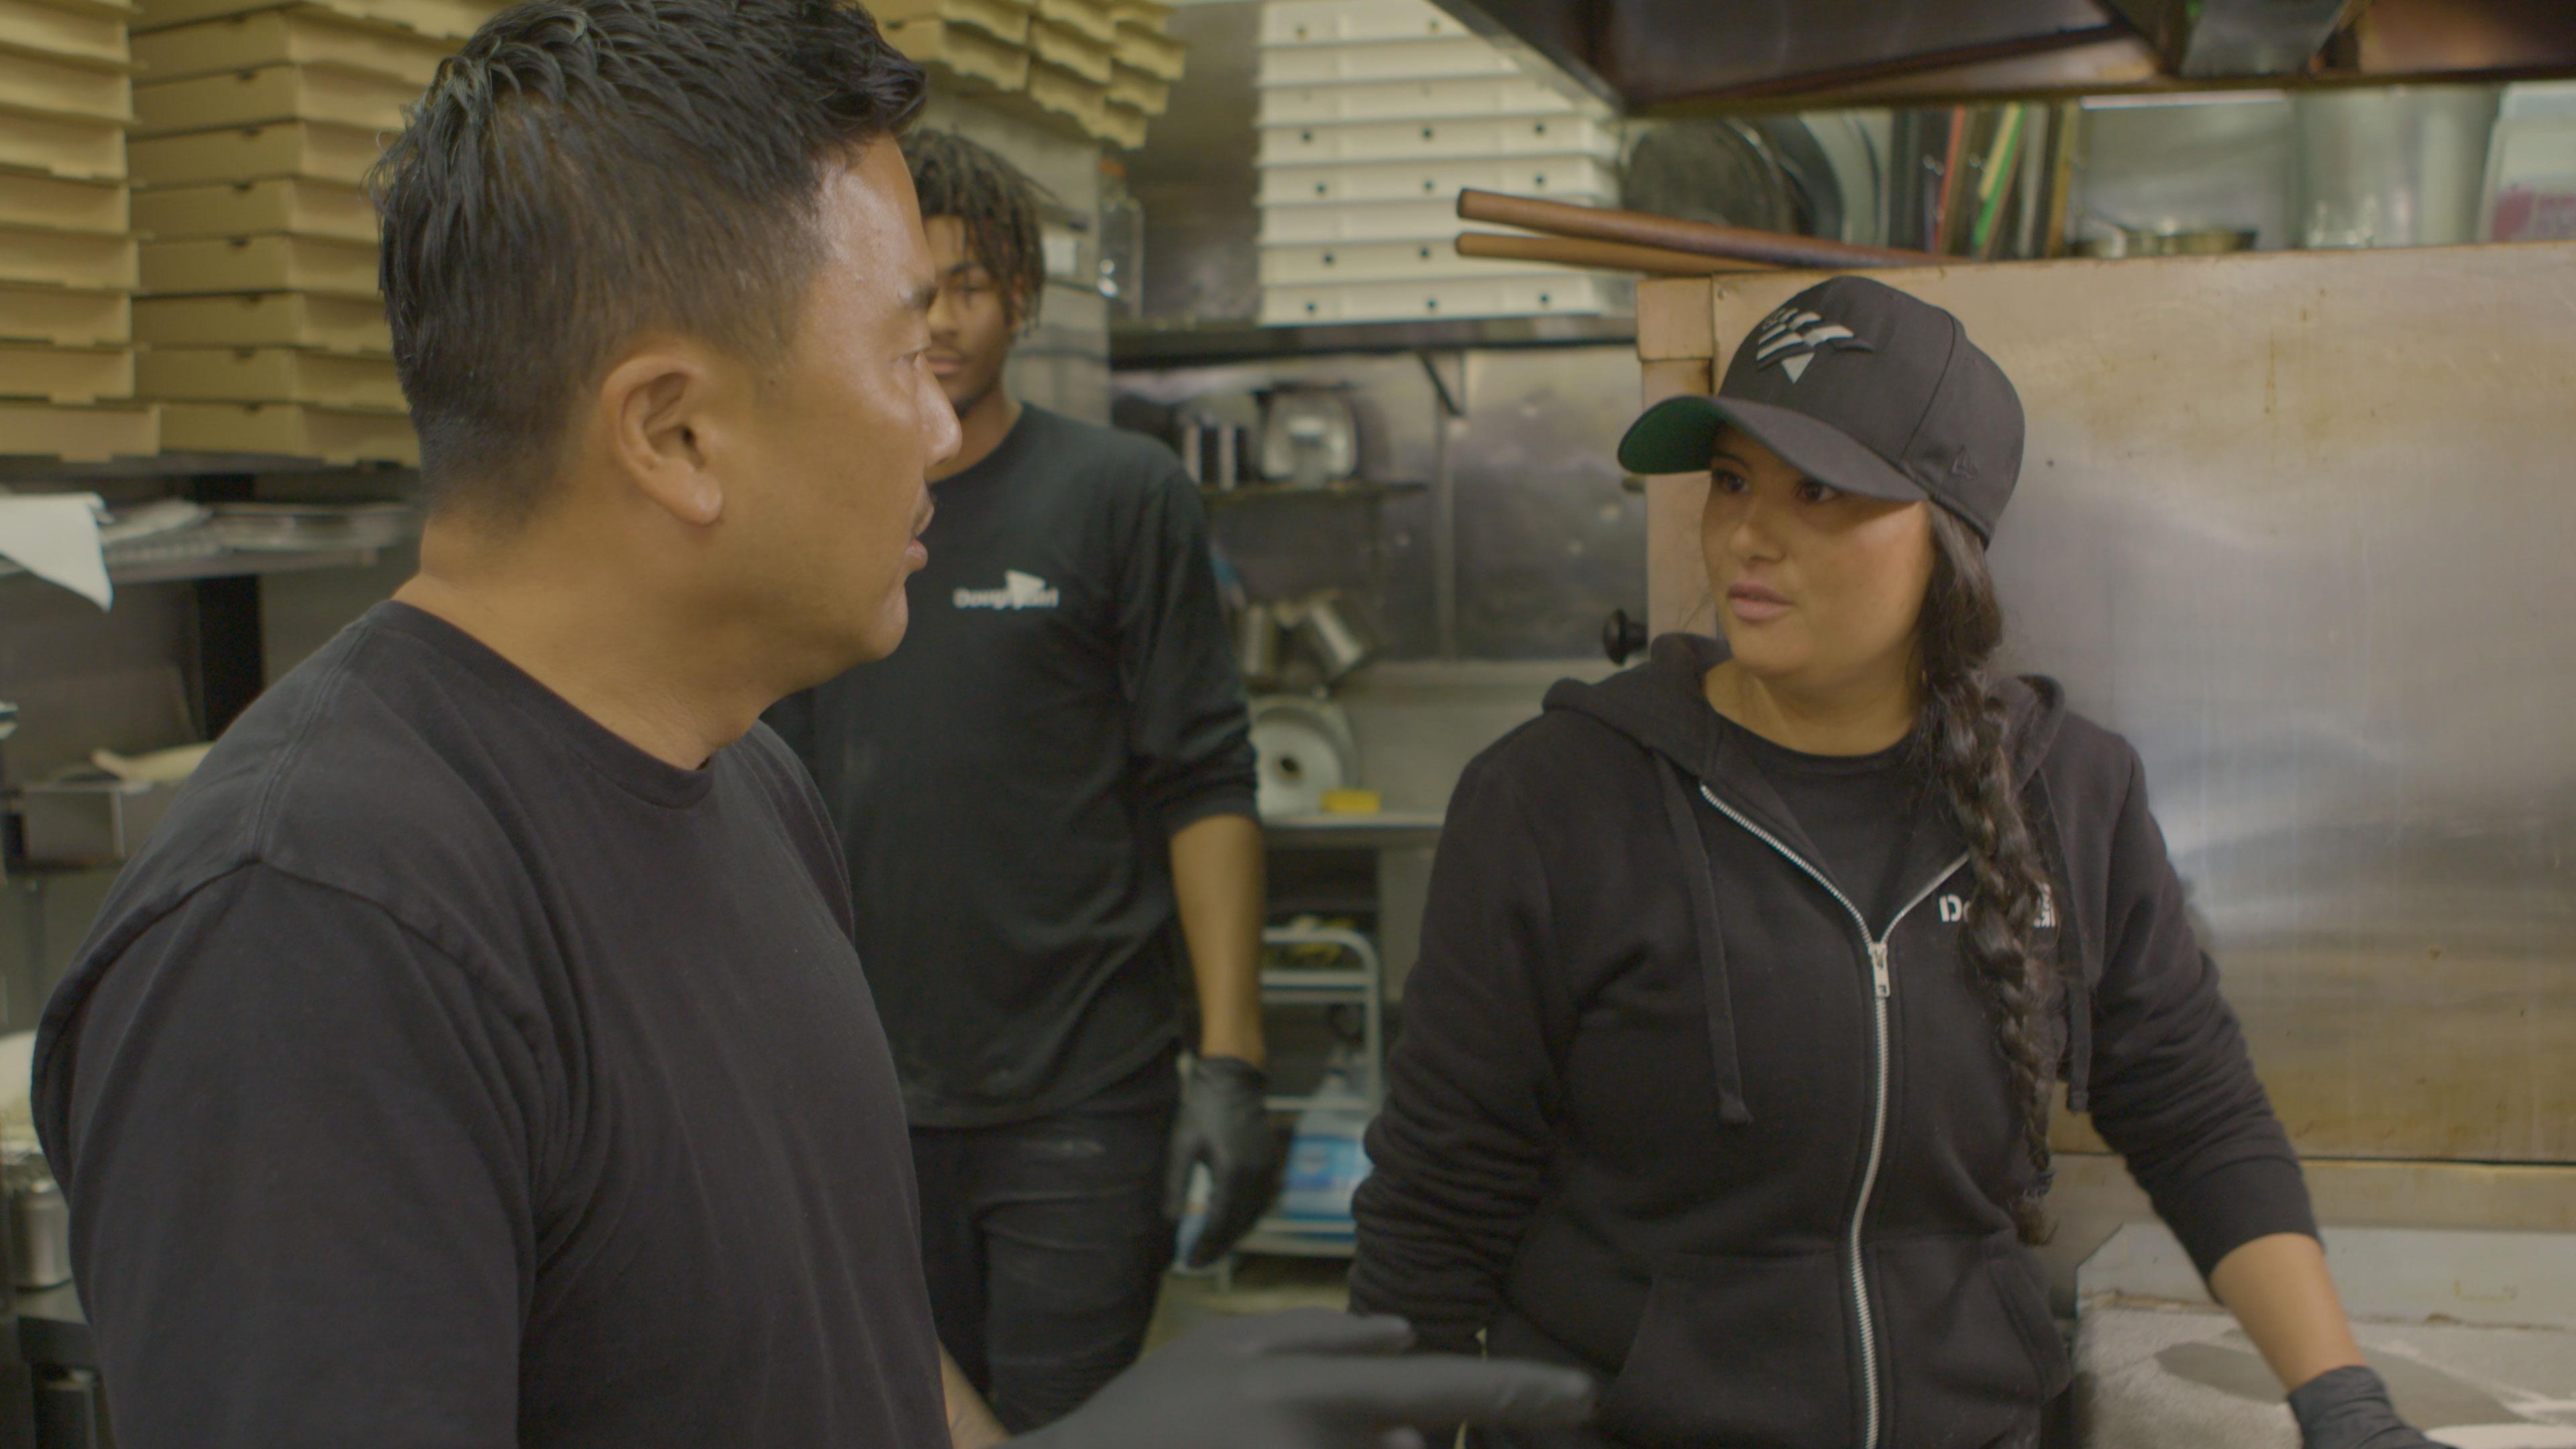 43be6de4d Roy Choi Takes a Deep Dive into the LA Food Scene With 'Broken Bread'